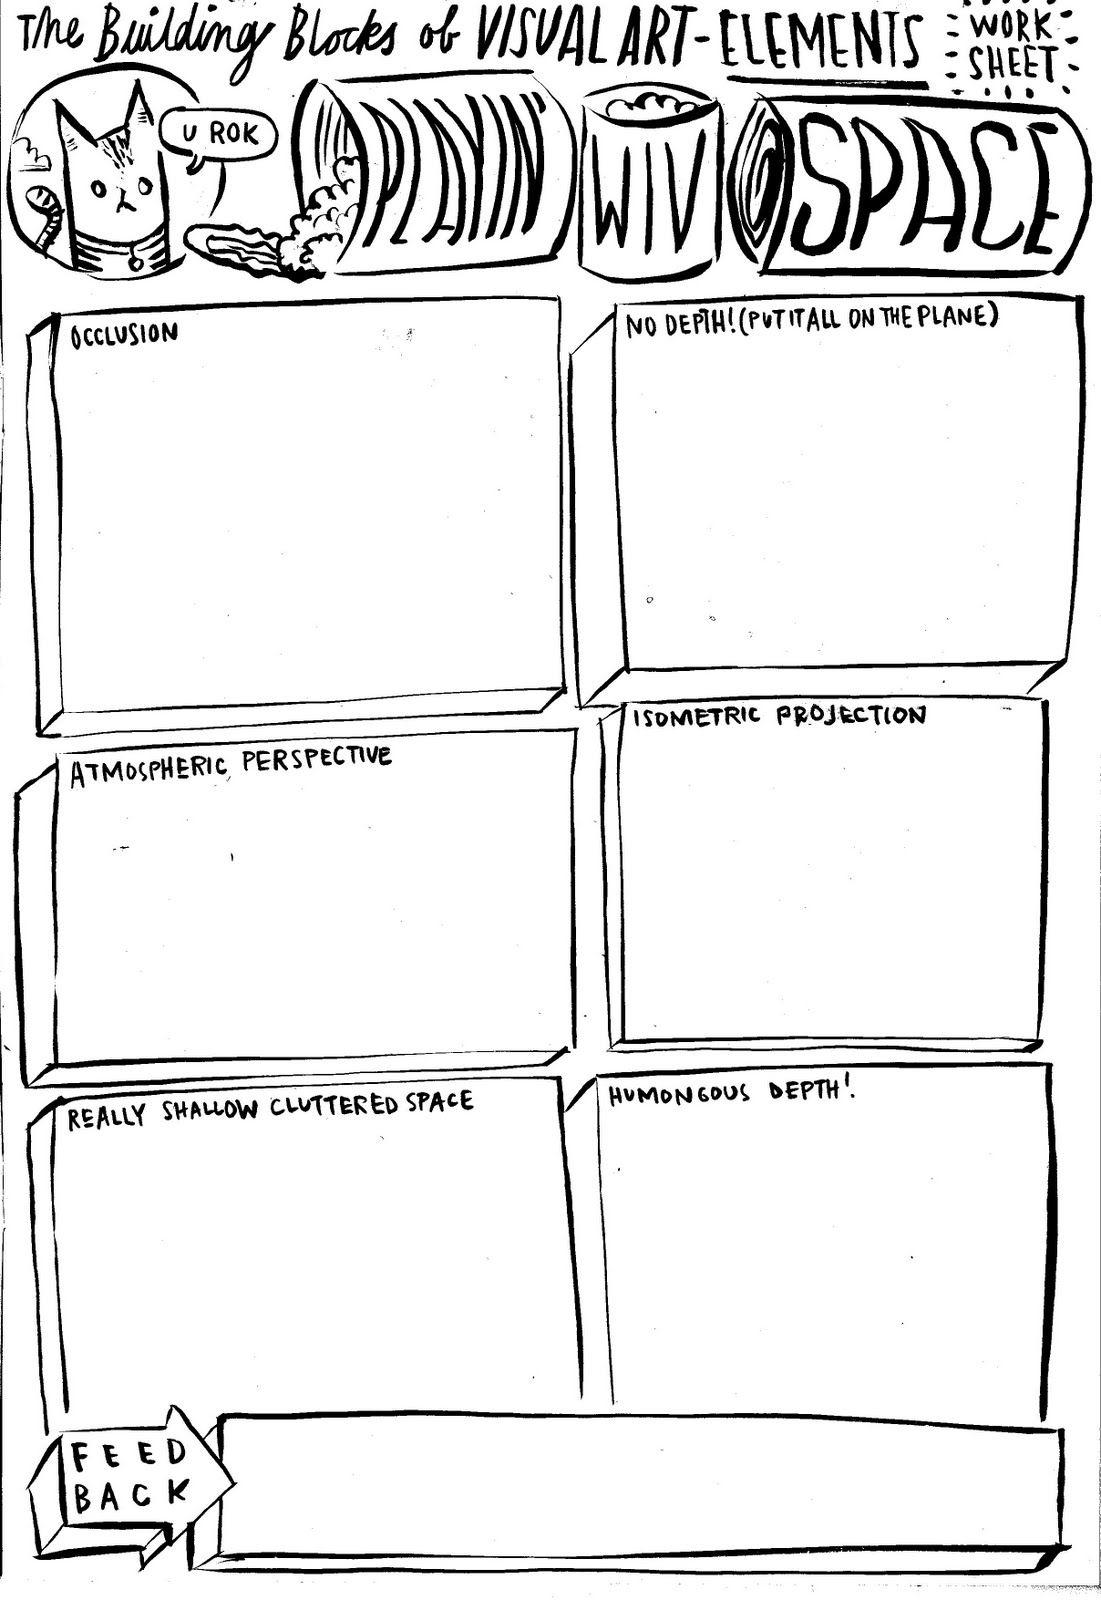 worksheet Elements Of Art Worksheet dan haycocks blog unbatondecolle lookowwwwwt worksheet avalanche art tips and tricks pinteres